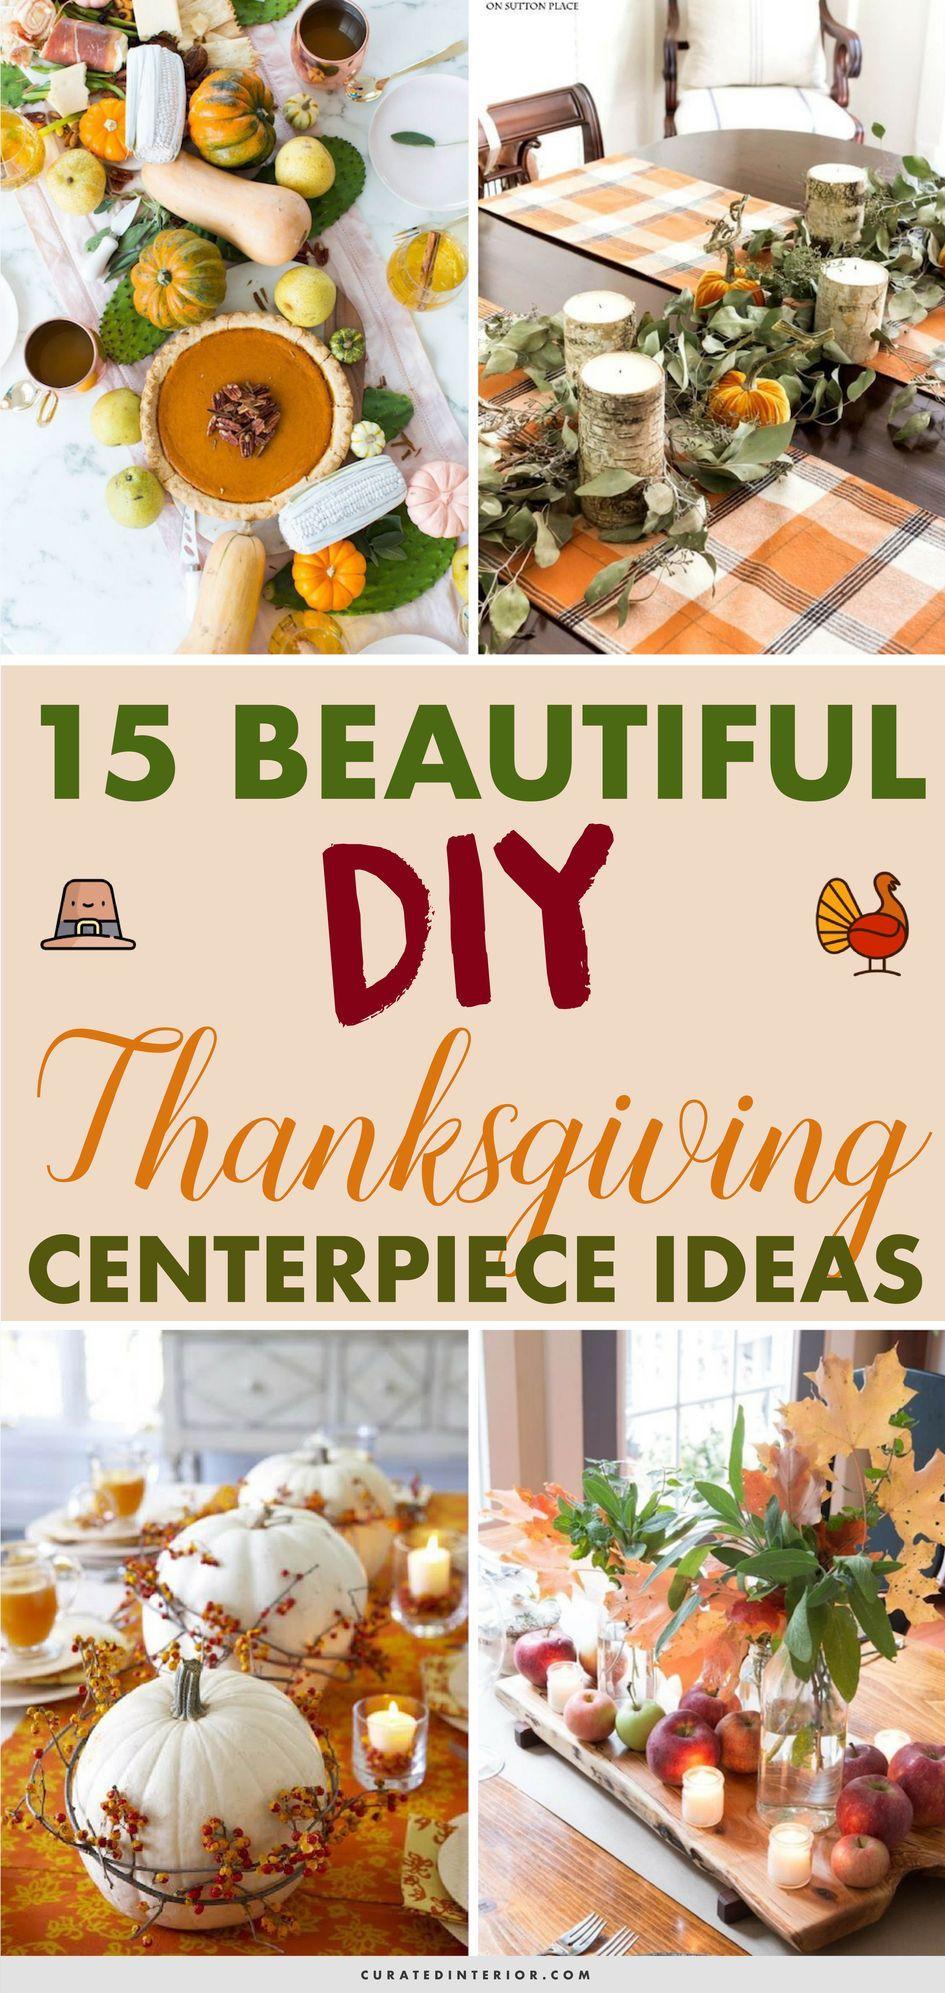 15 Beautiful DIY Thanksgiving Centerpiece Ideas! #ThanksgivingDecor #ThanksgivingDIY #ThanksgivingTable